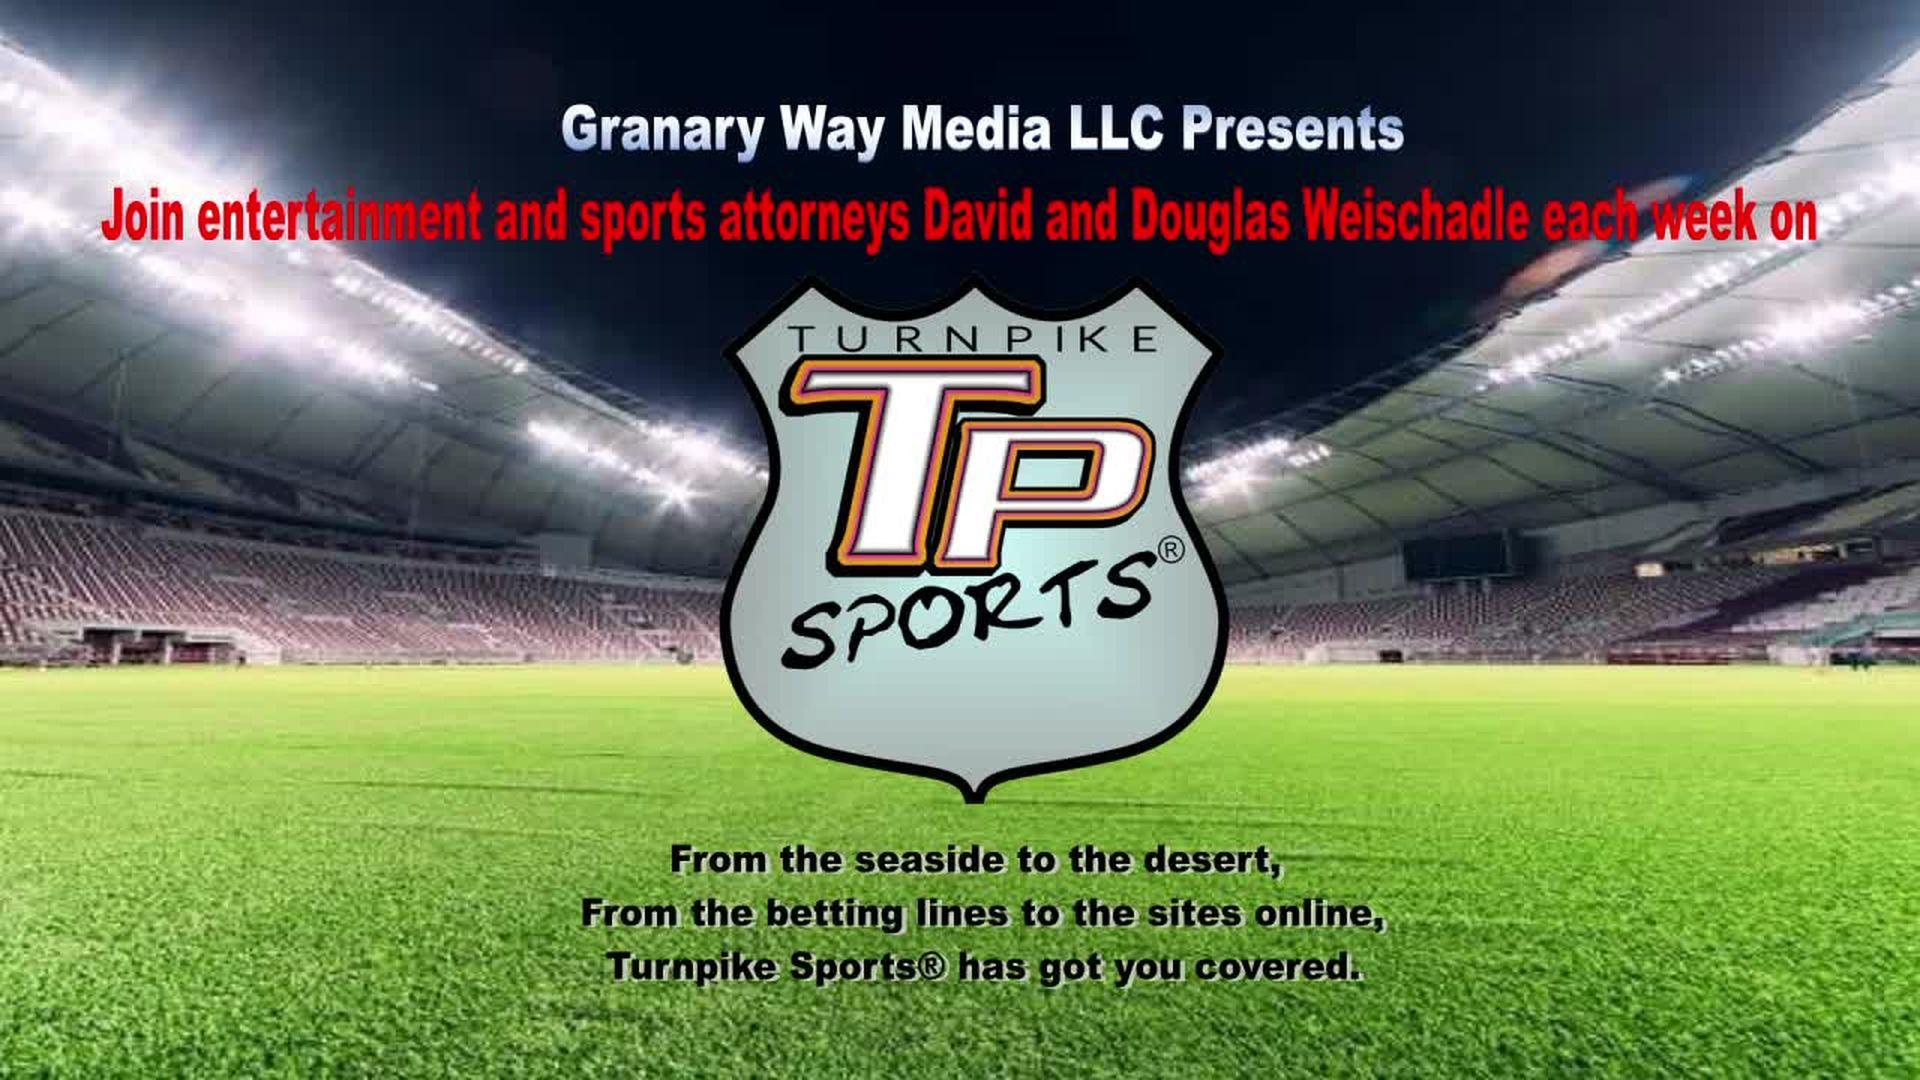 Turnpike Sports® - S 3 - Ep 53